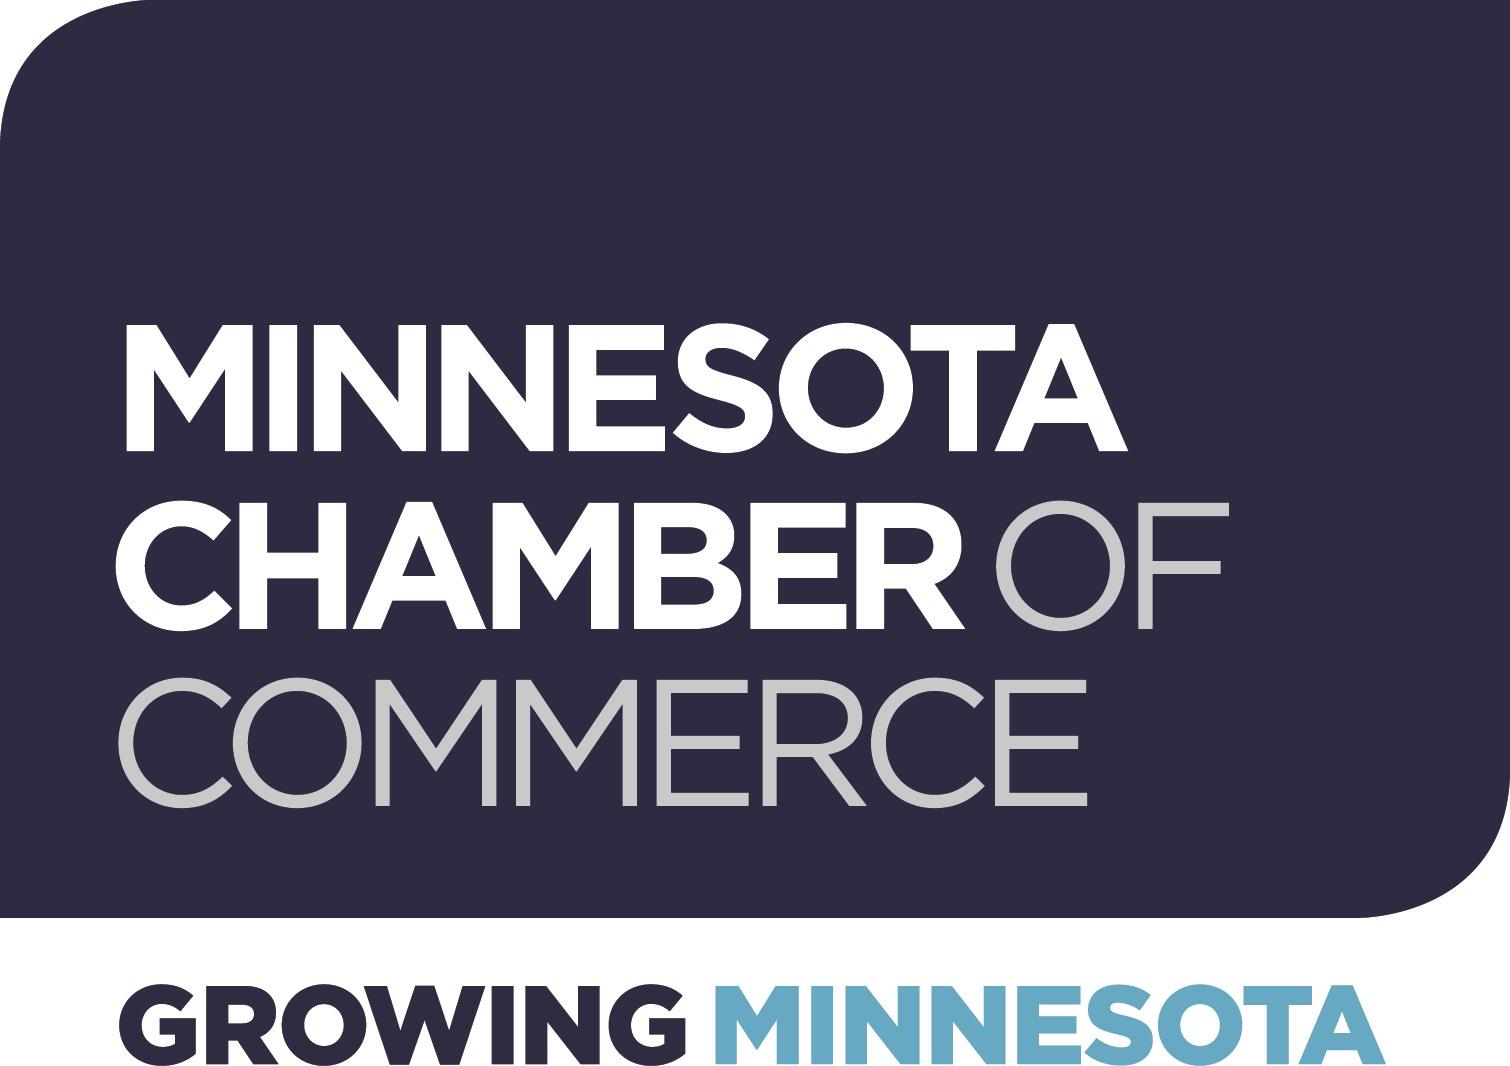 Minnesota Chamber of Commerce